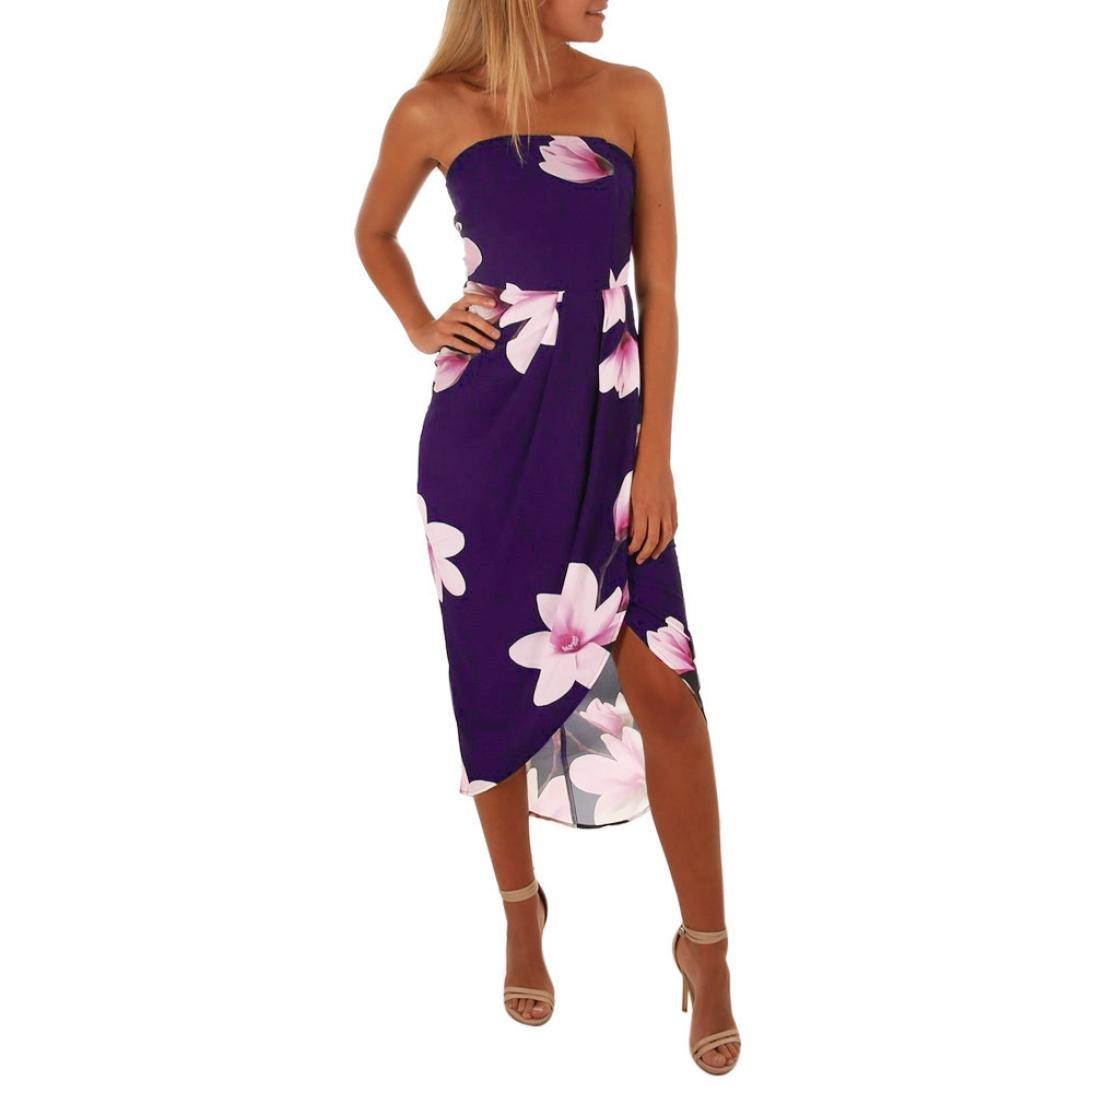 c8649c25cf13 Kangma Women Online Summer Off The Shoulder Boho Lady Beach Sundrss Maxi  Dress Purple at Amazon Women s Clothing store